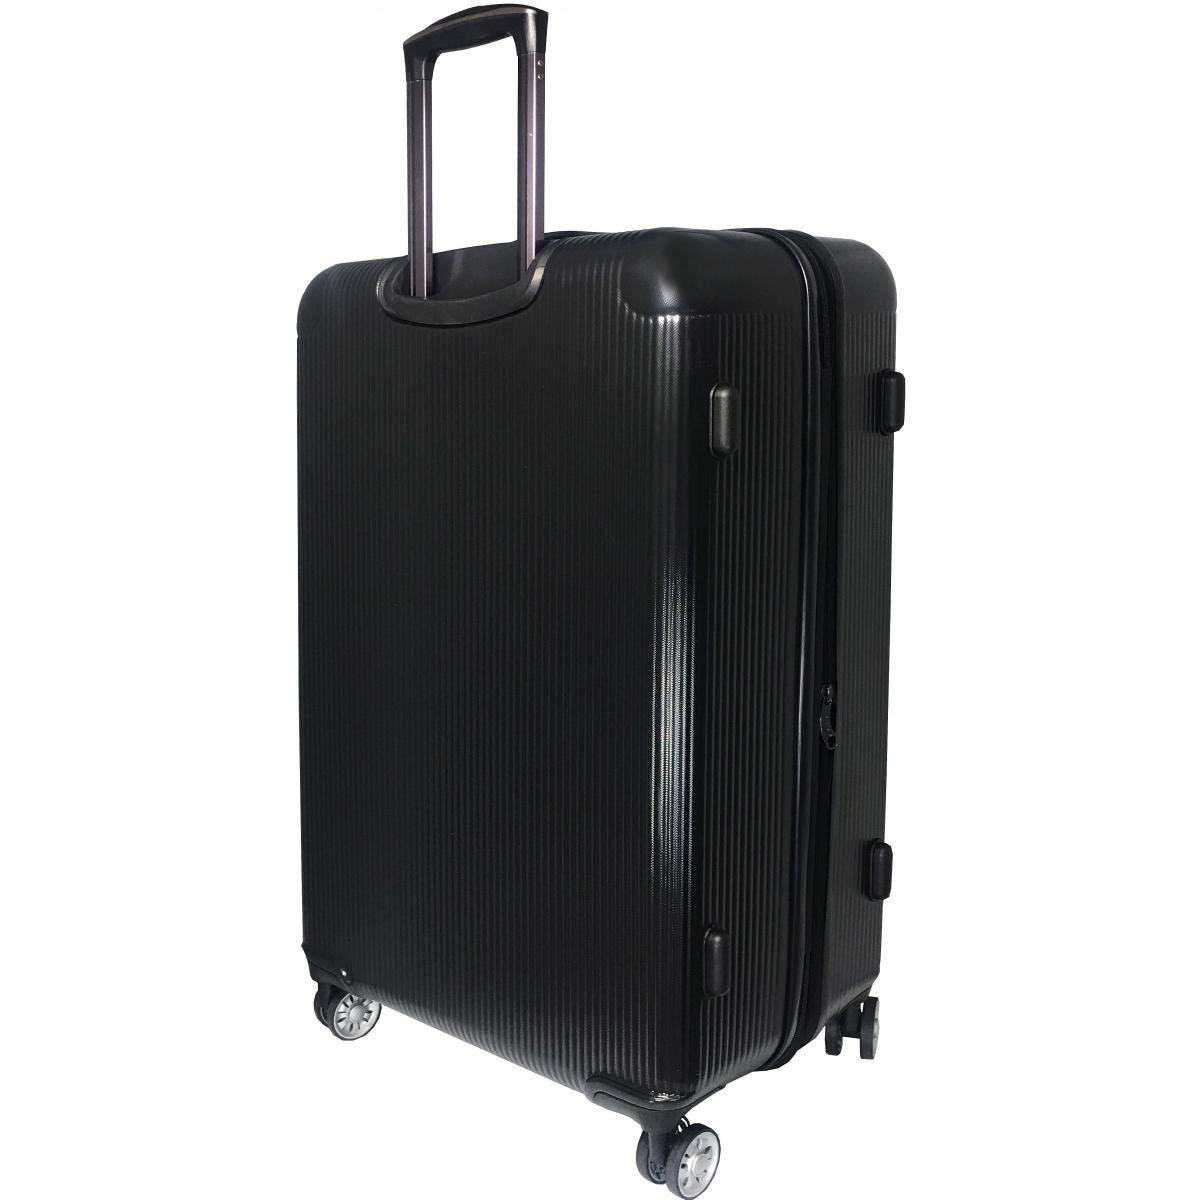 valise rigide david jones tsa abs 77 cm grande taille ba10251g noir couleur principale. Black Bedroom Furniture Sets. Home Design Ideas